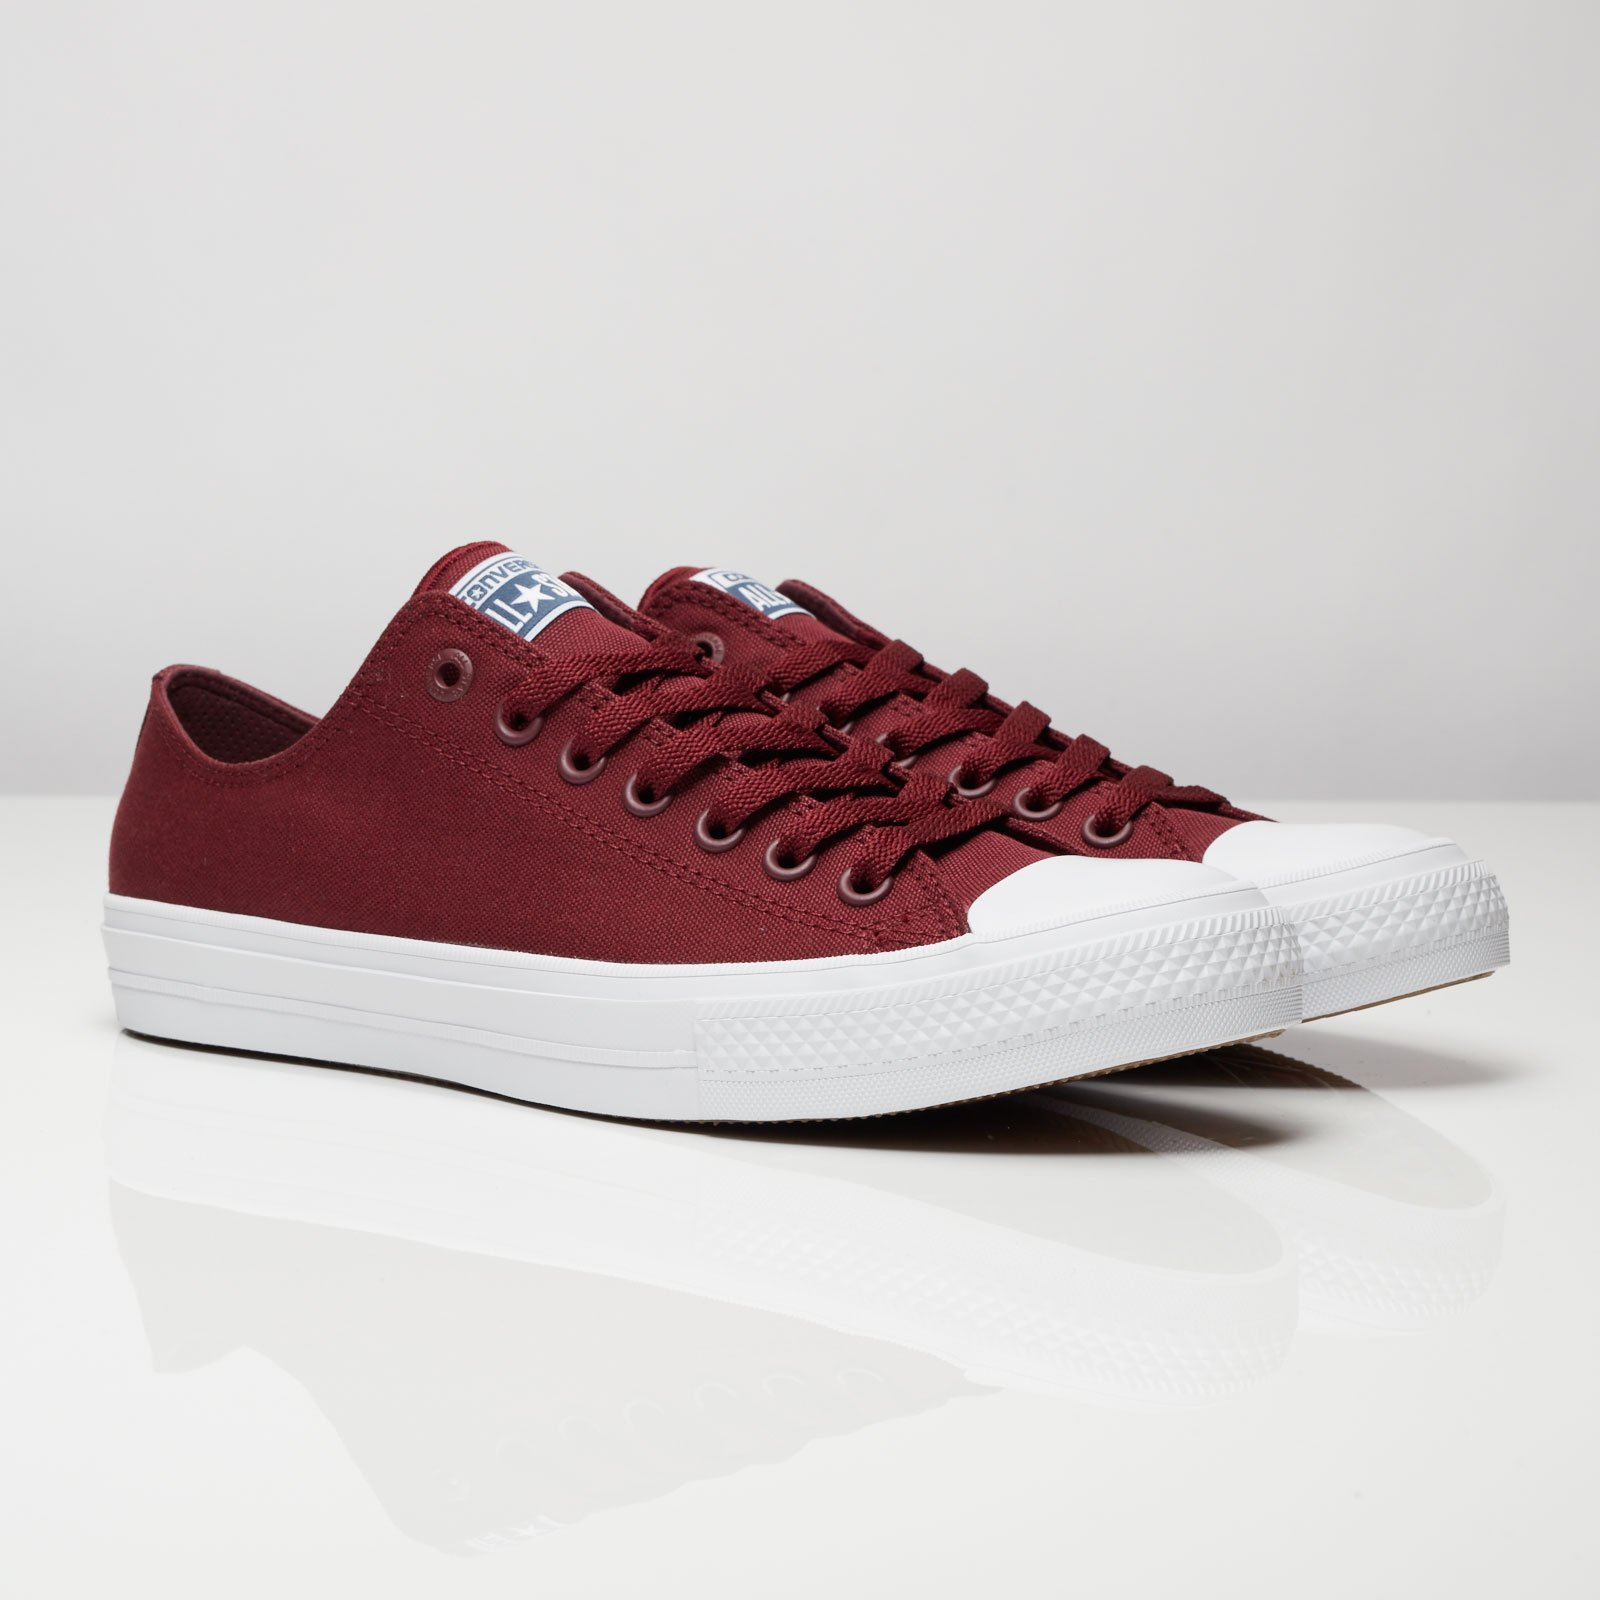 Converse Chuck Taylor II Ox - 150150c - Sneakersnstuff   sneakers